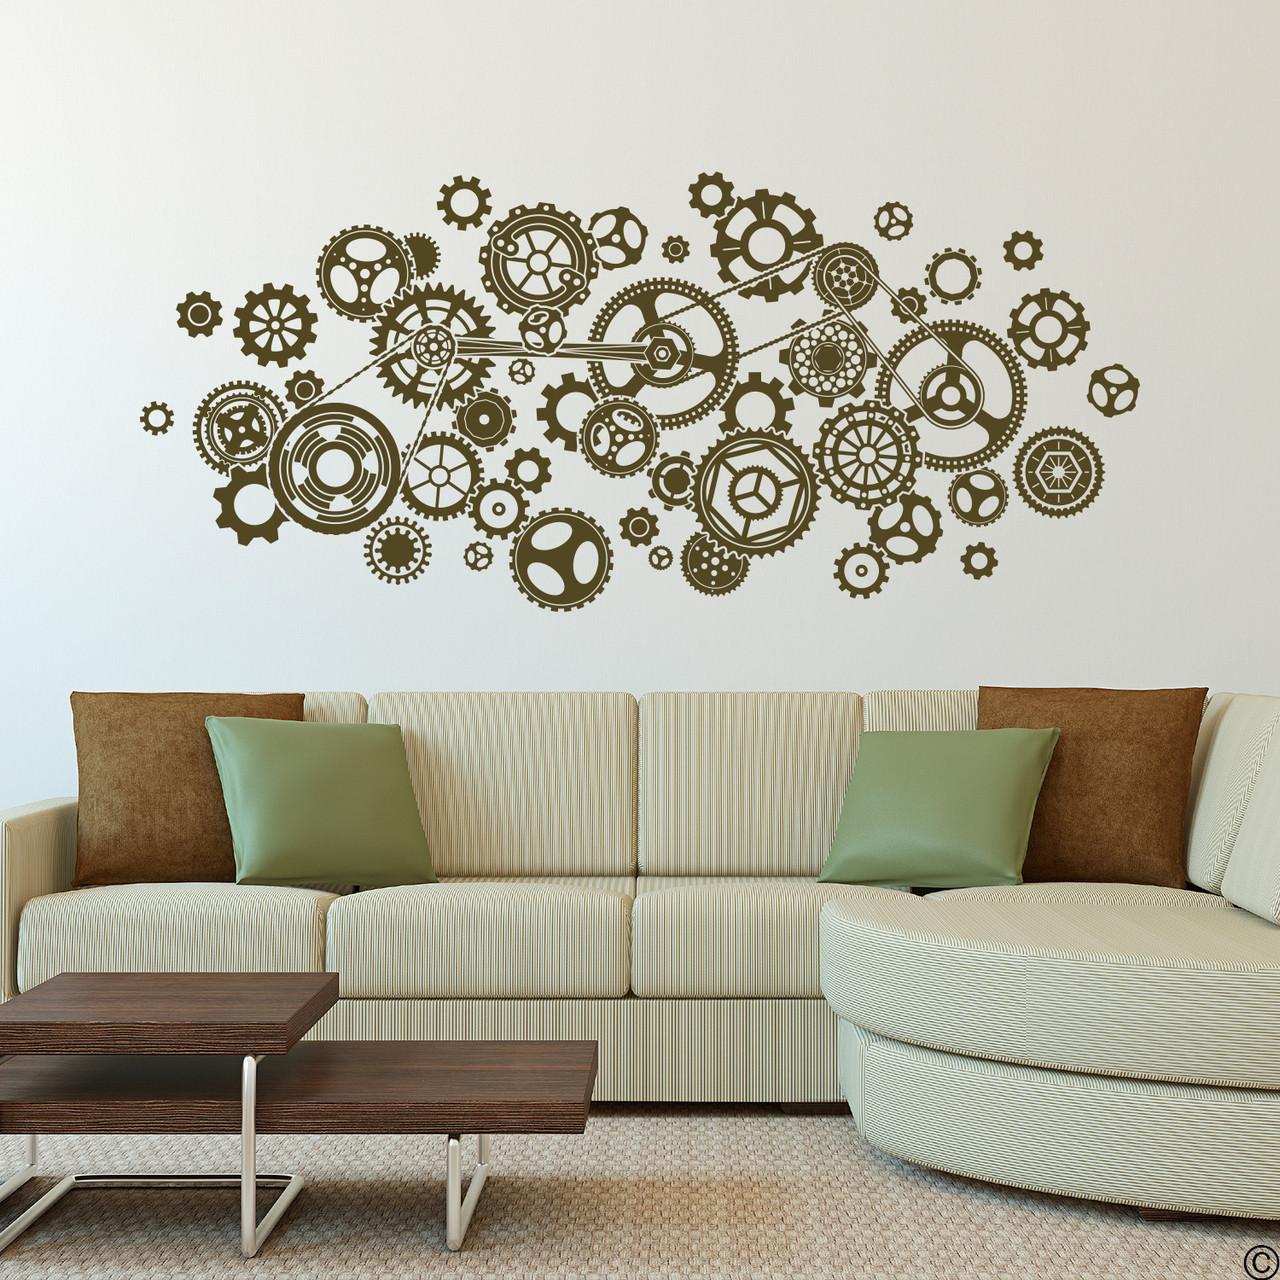 Steampunk Gears Vinyl Wall Decal in nougat brown